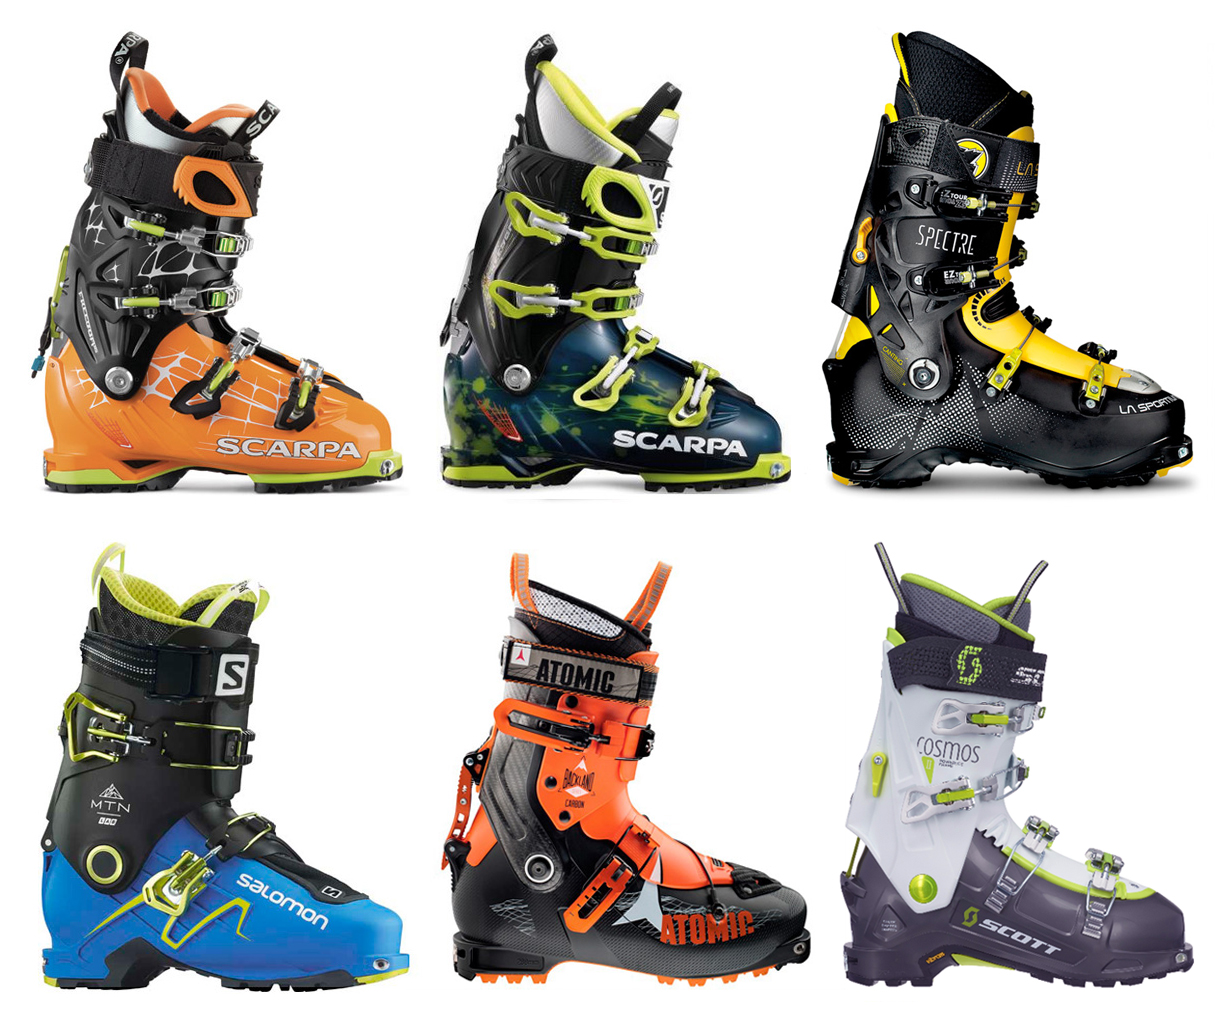 Freeride Working Nwpd Ski No On Powder Boots – Days kiXuOTPZ